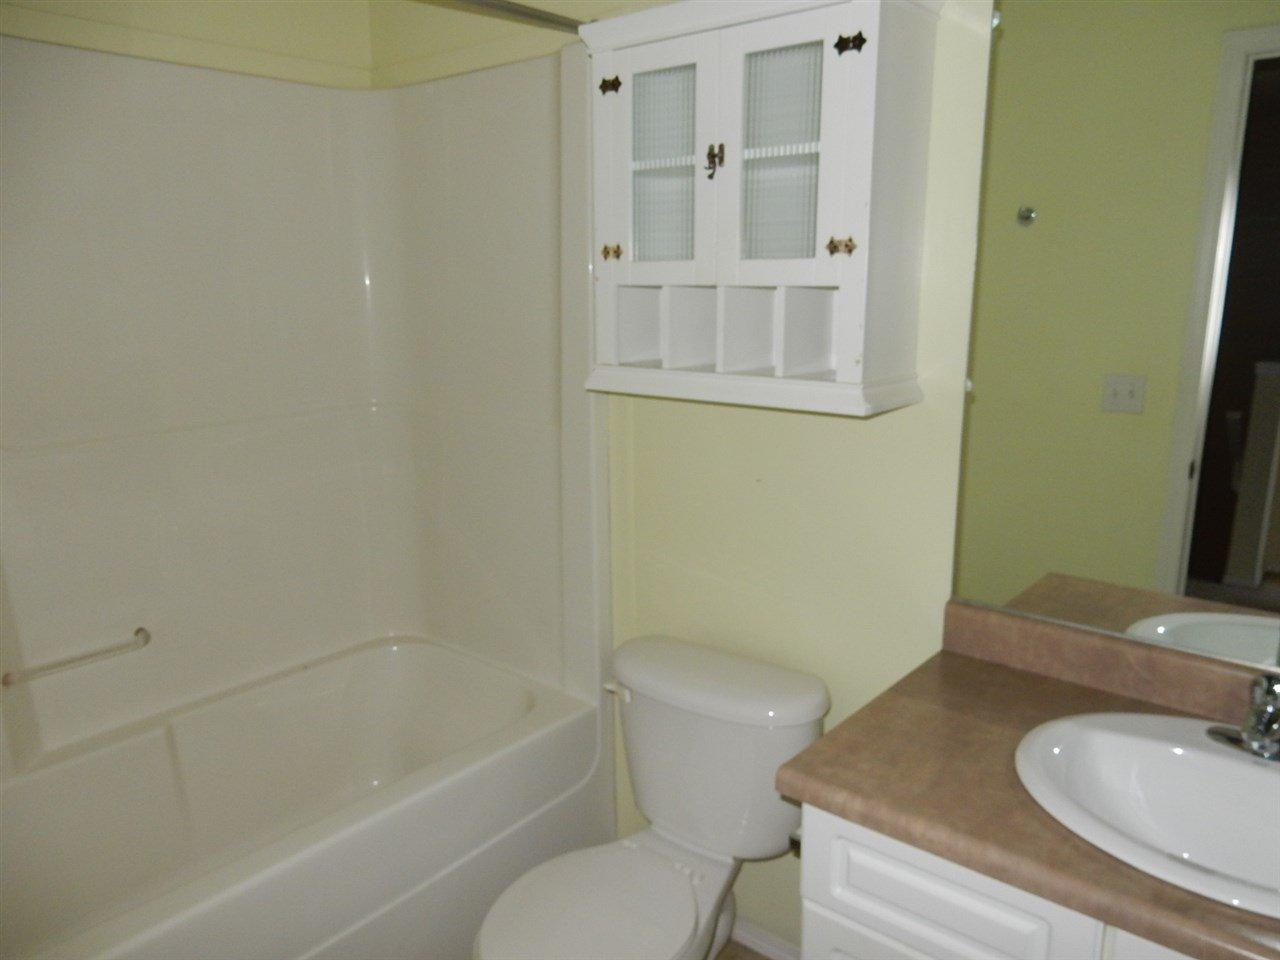 Photo 9: Photos: 3443 McKay Lane in Edmonton: Zone 55 House Half Duplex for sale : MLS®# E4173243